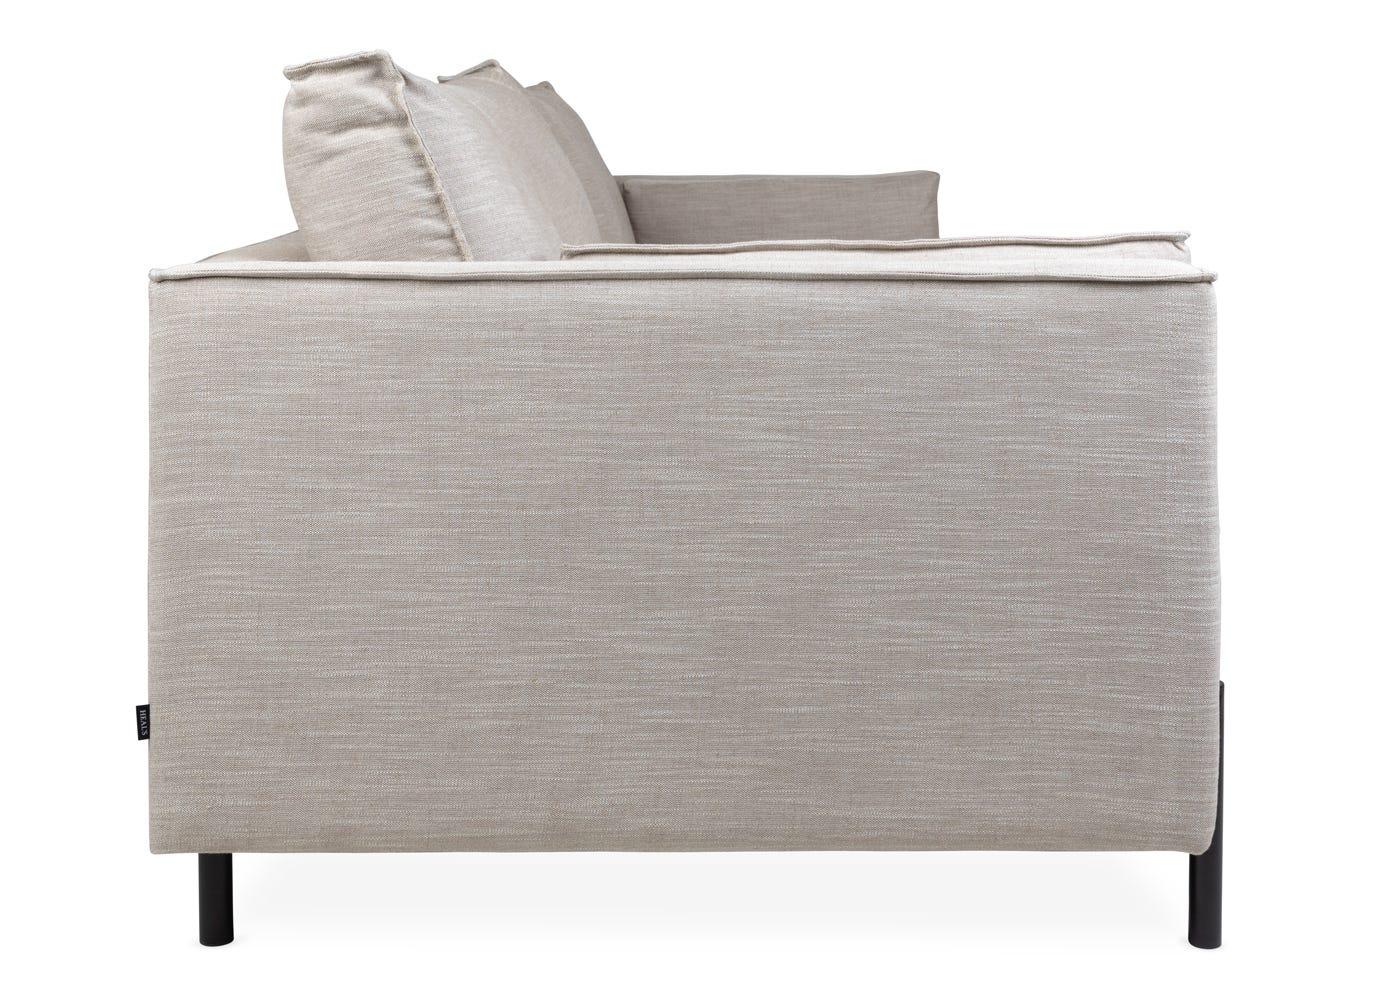 Tortona 4 Seater Sofa in Broad Weave Putty - Side